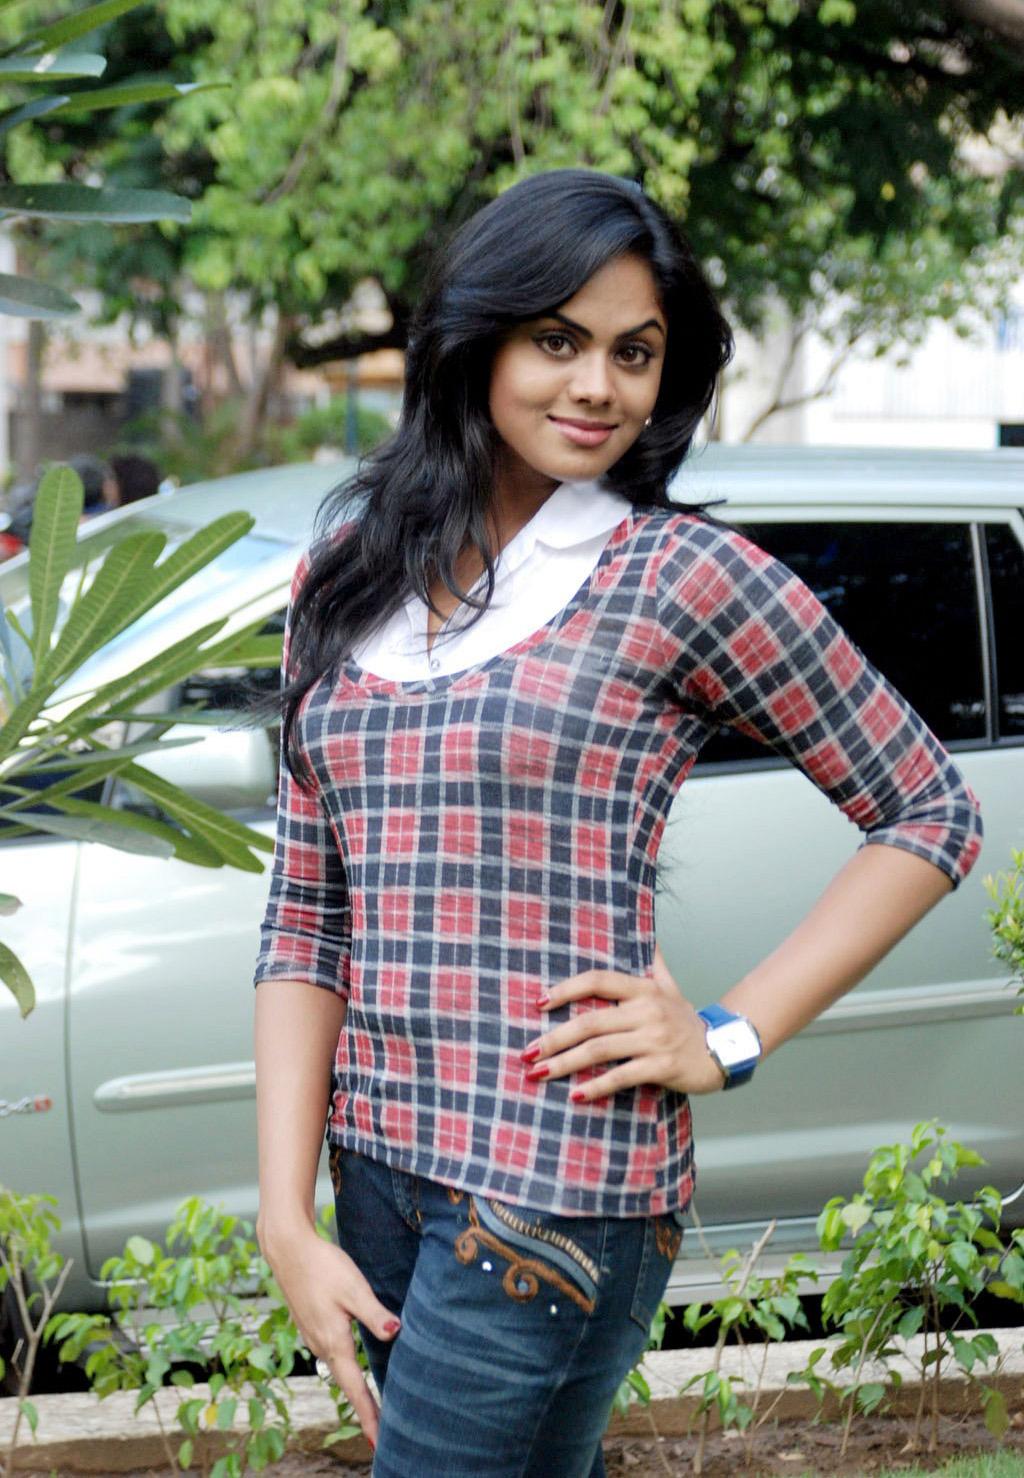 Karthika nair out door photos